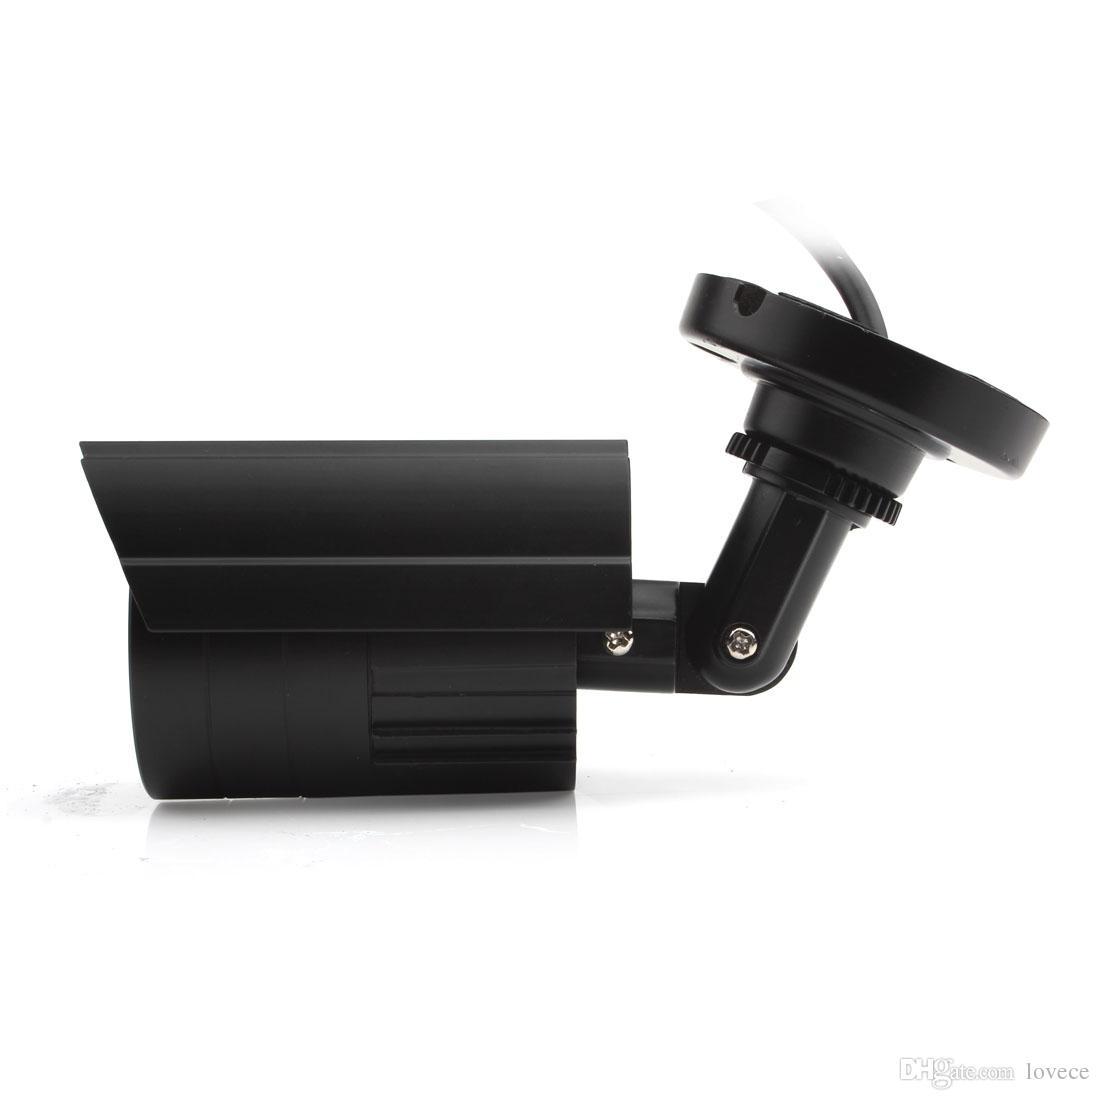 1000TVL 6mm Lens 1/3 CMOS Outdoor CCTV Security Camera IR Color Night Vision Waterproof CCT_154